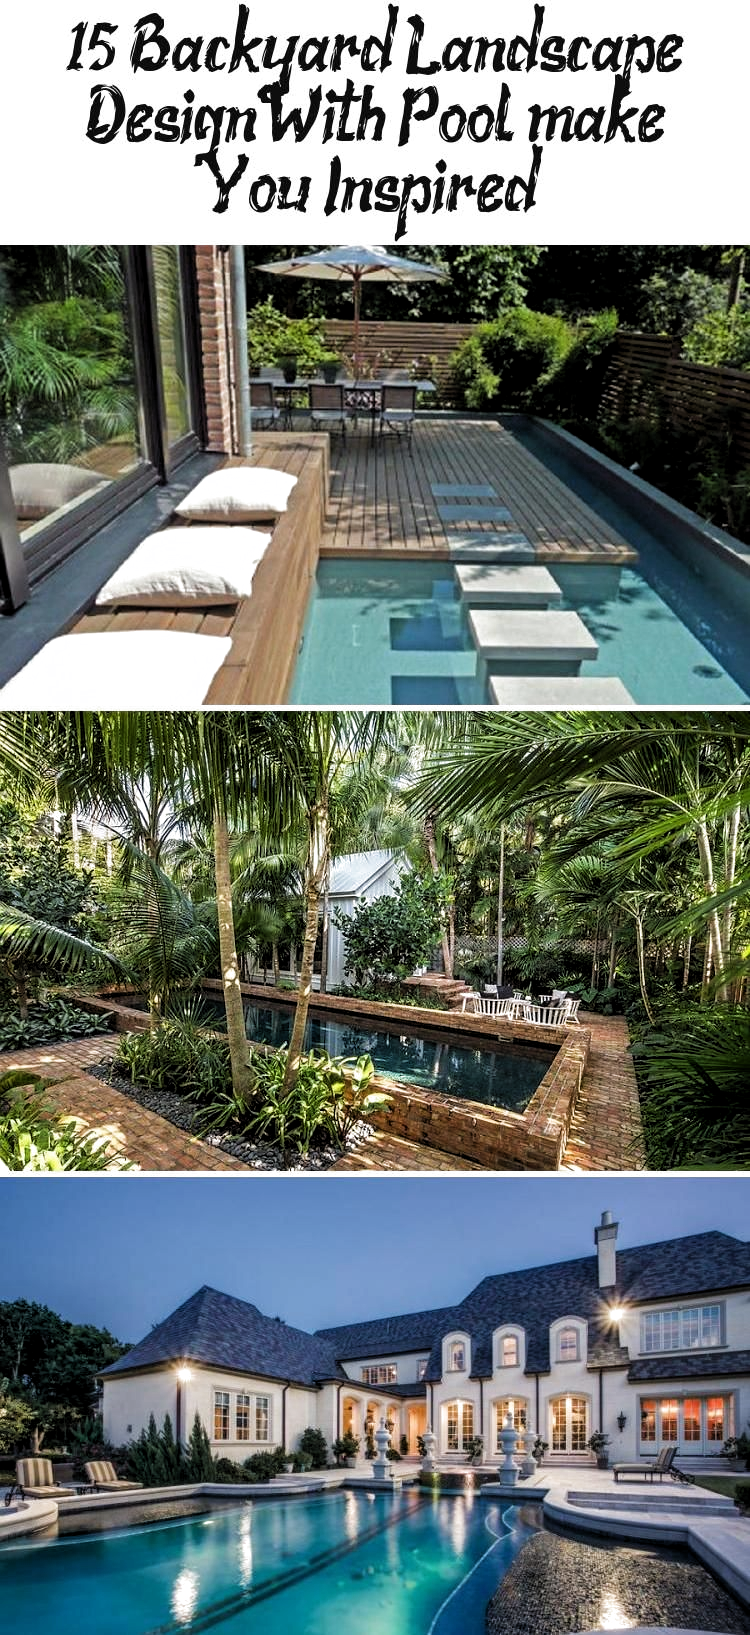 Amazing pool! #pool #house #housegoals #dream #luxury #money #work #home #cars #LuxuryHousesBeach #LuxuryHousesKitchen #LuxuryHousesAustralia #LuxuryHousesItaly #LuxuryHousesMinimalist